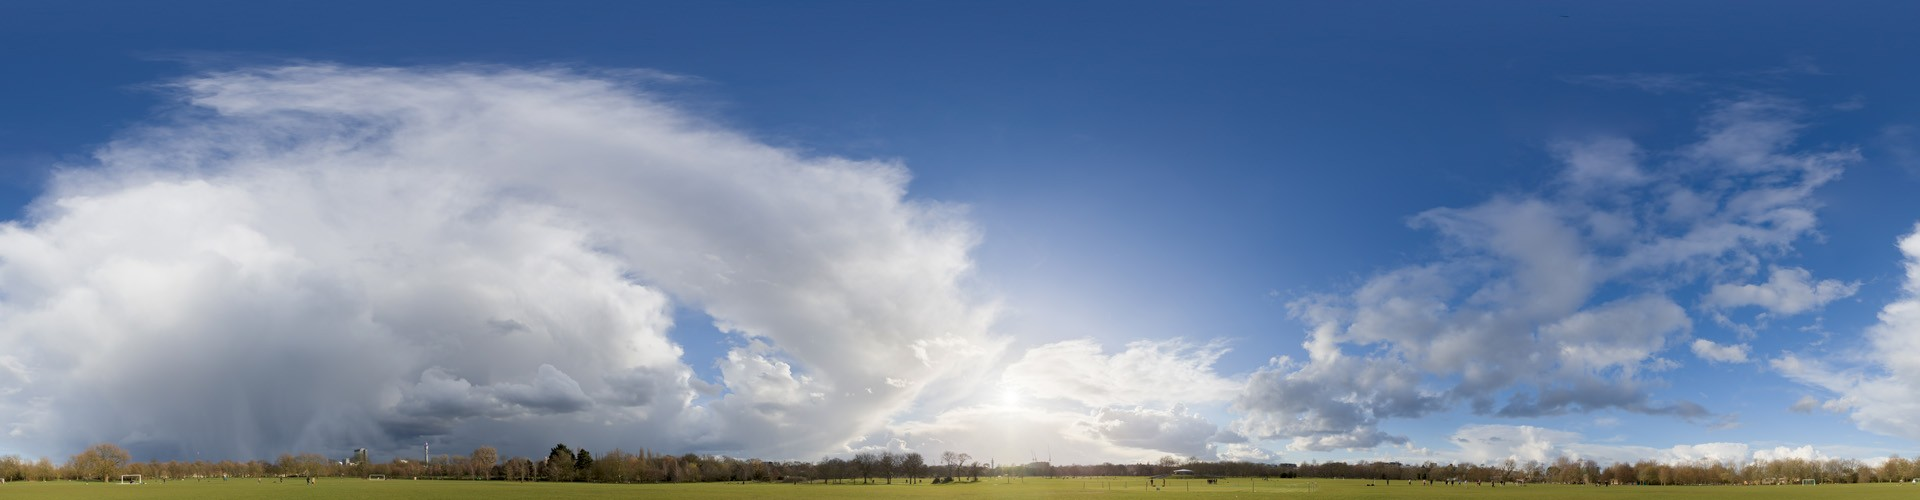 Rainy Clouds 2426 (30k) HDRI